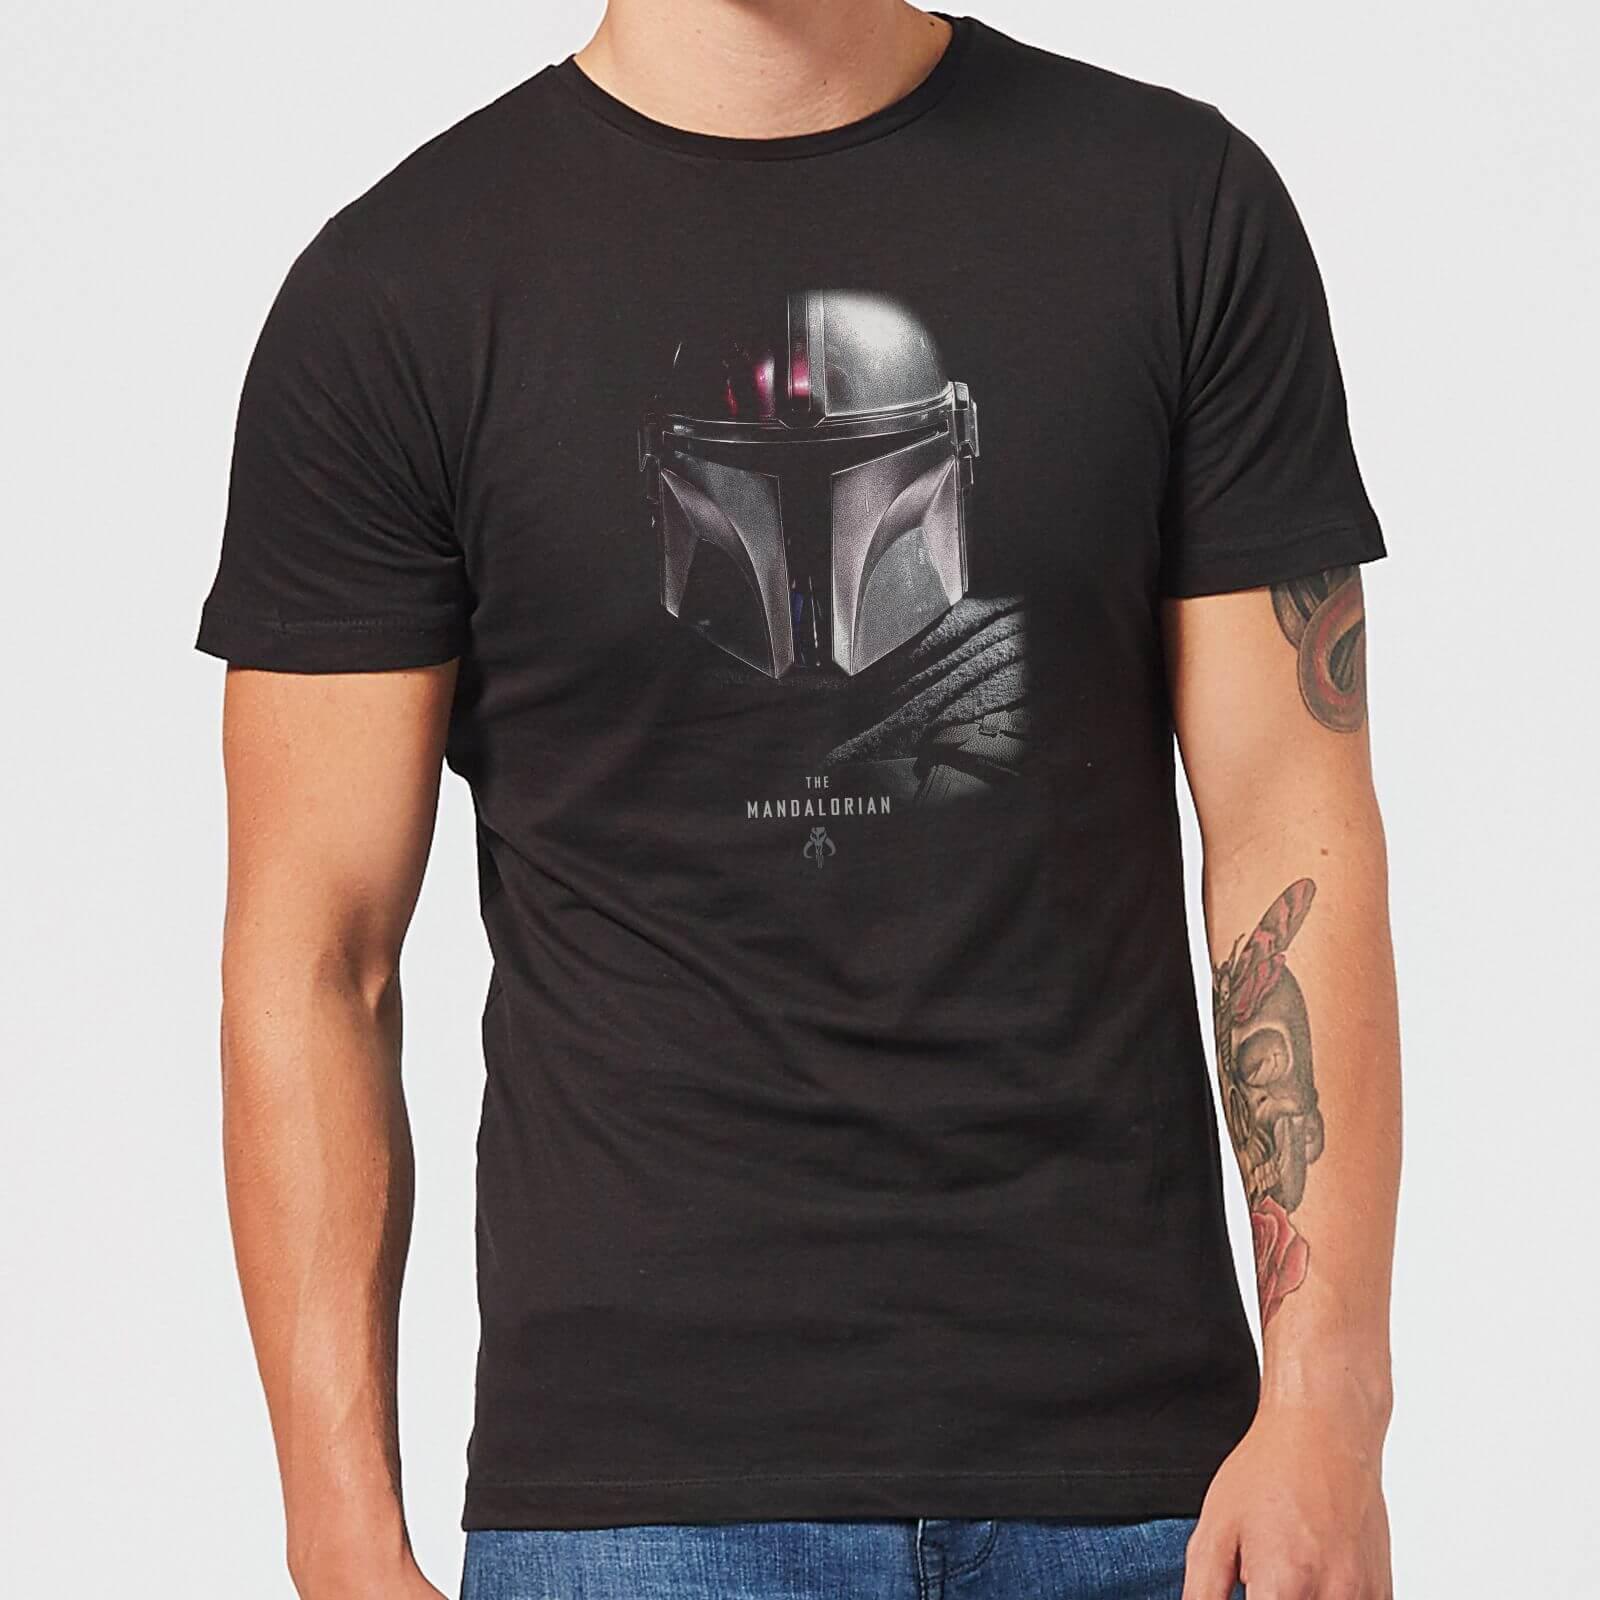 Star Wars Mandalorian Shirts & Pullis mit 40% Rabatt + Gratis Versand, z.B. Mandalorian Poster T-Shirt